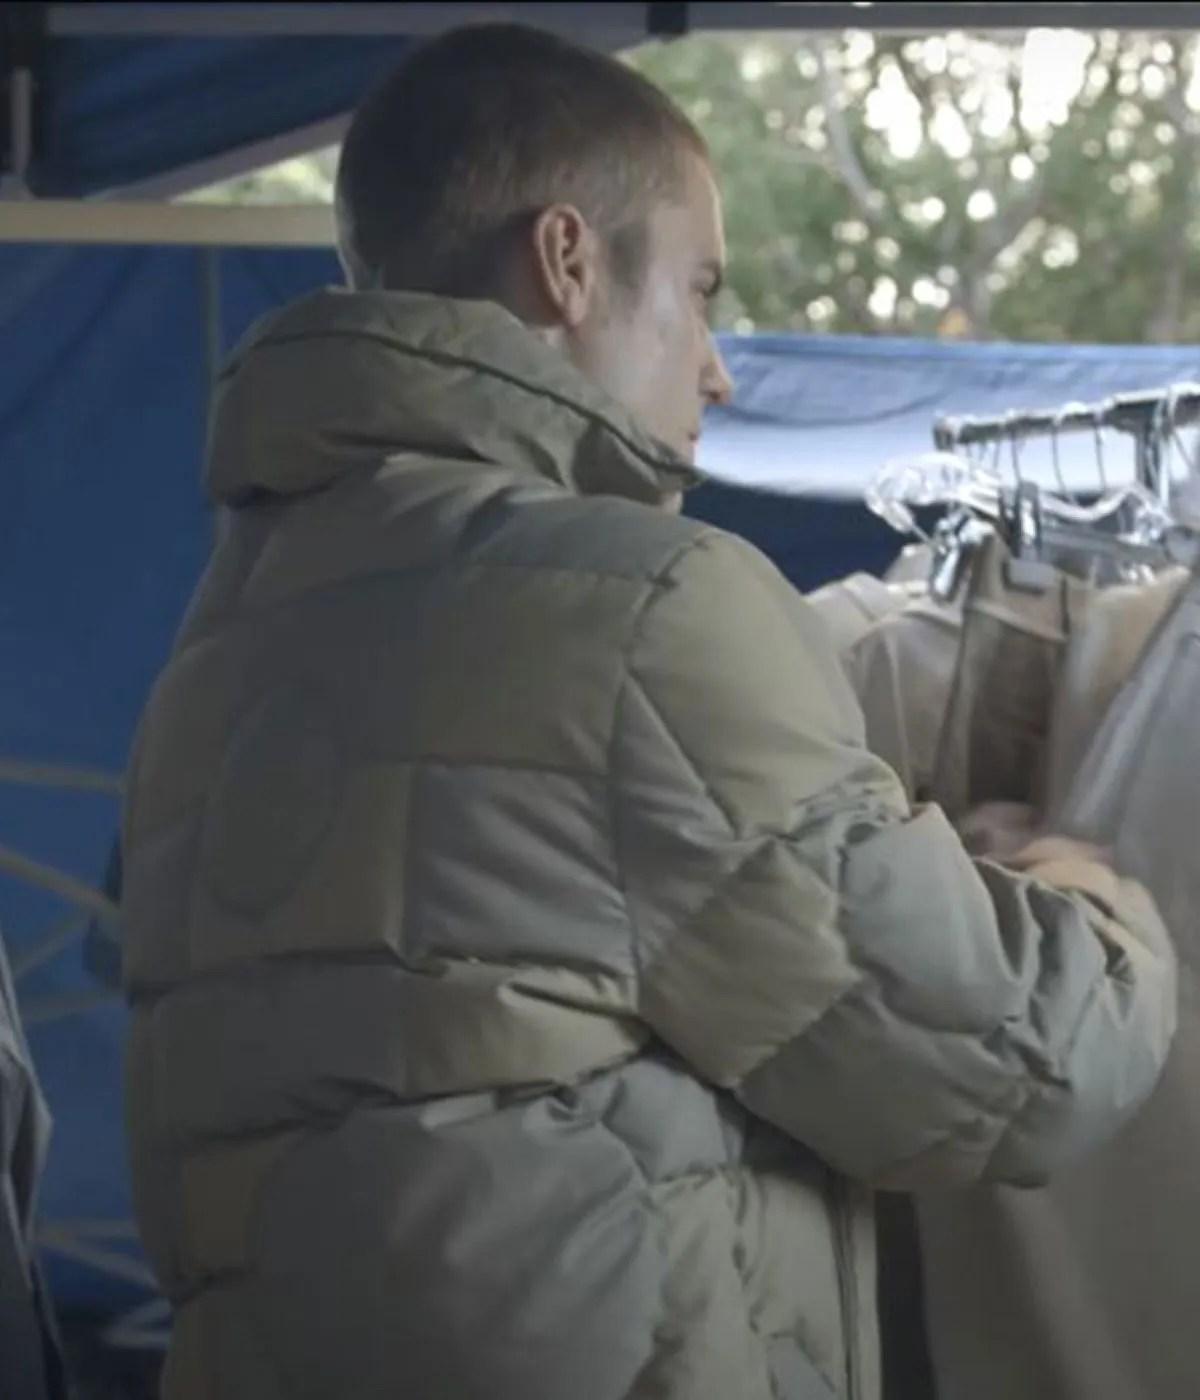 justin-bieber-stay-grey-puffer-jacket